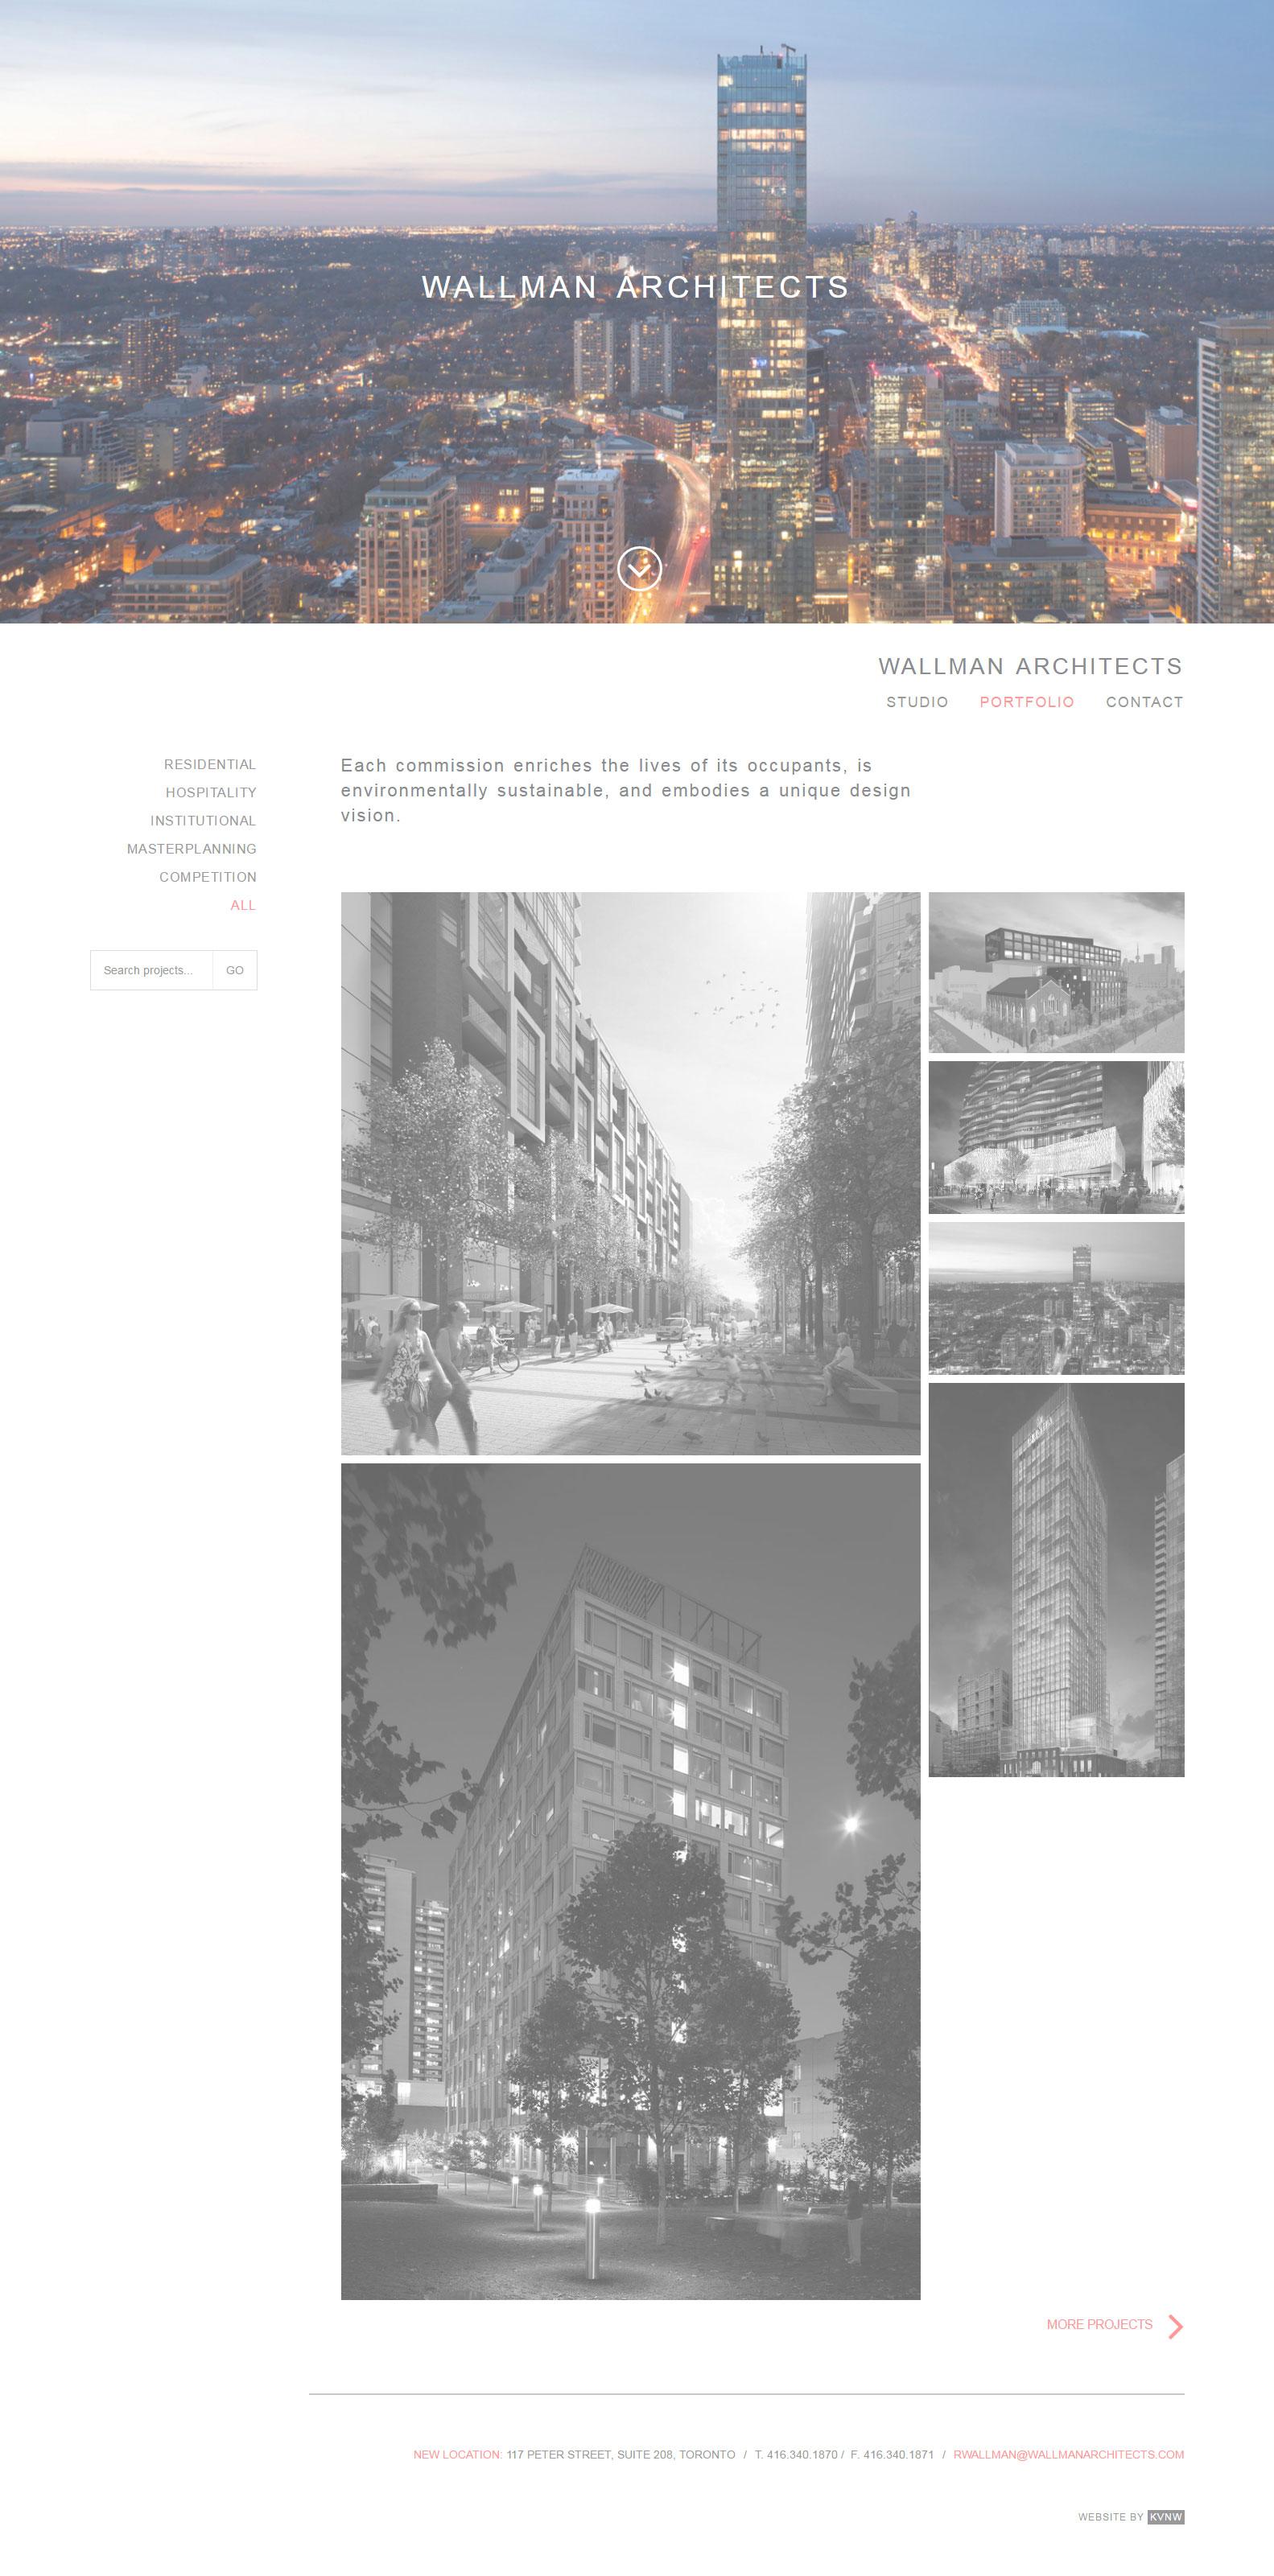 Wallman Architects Website Design Mockup Toronto